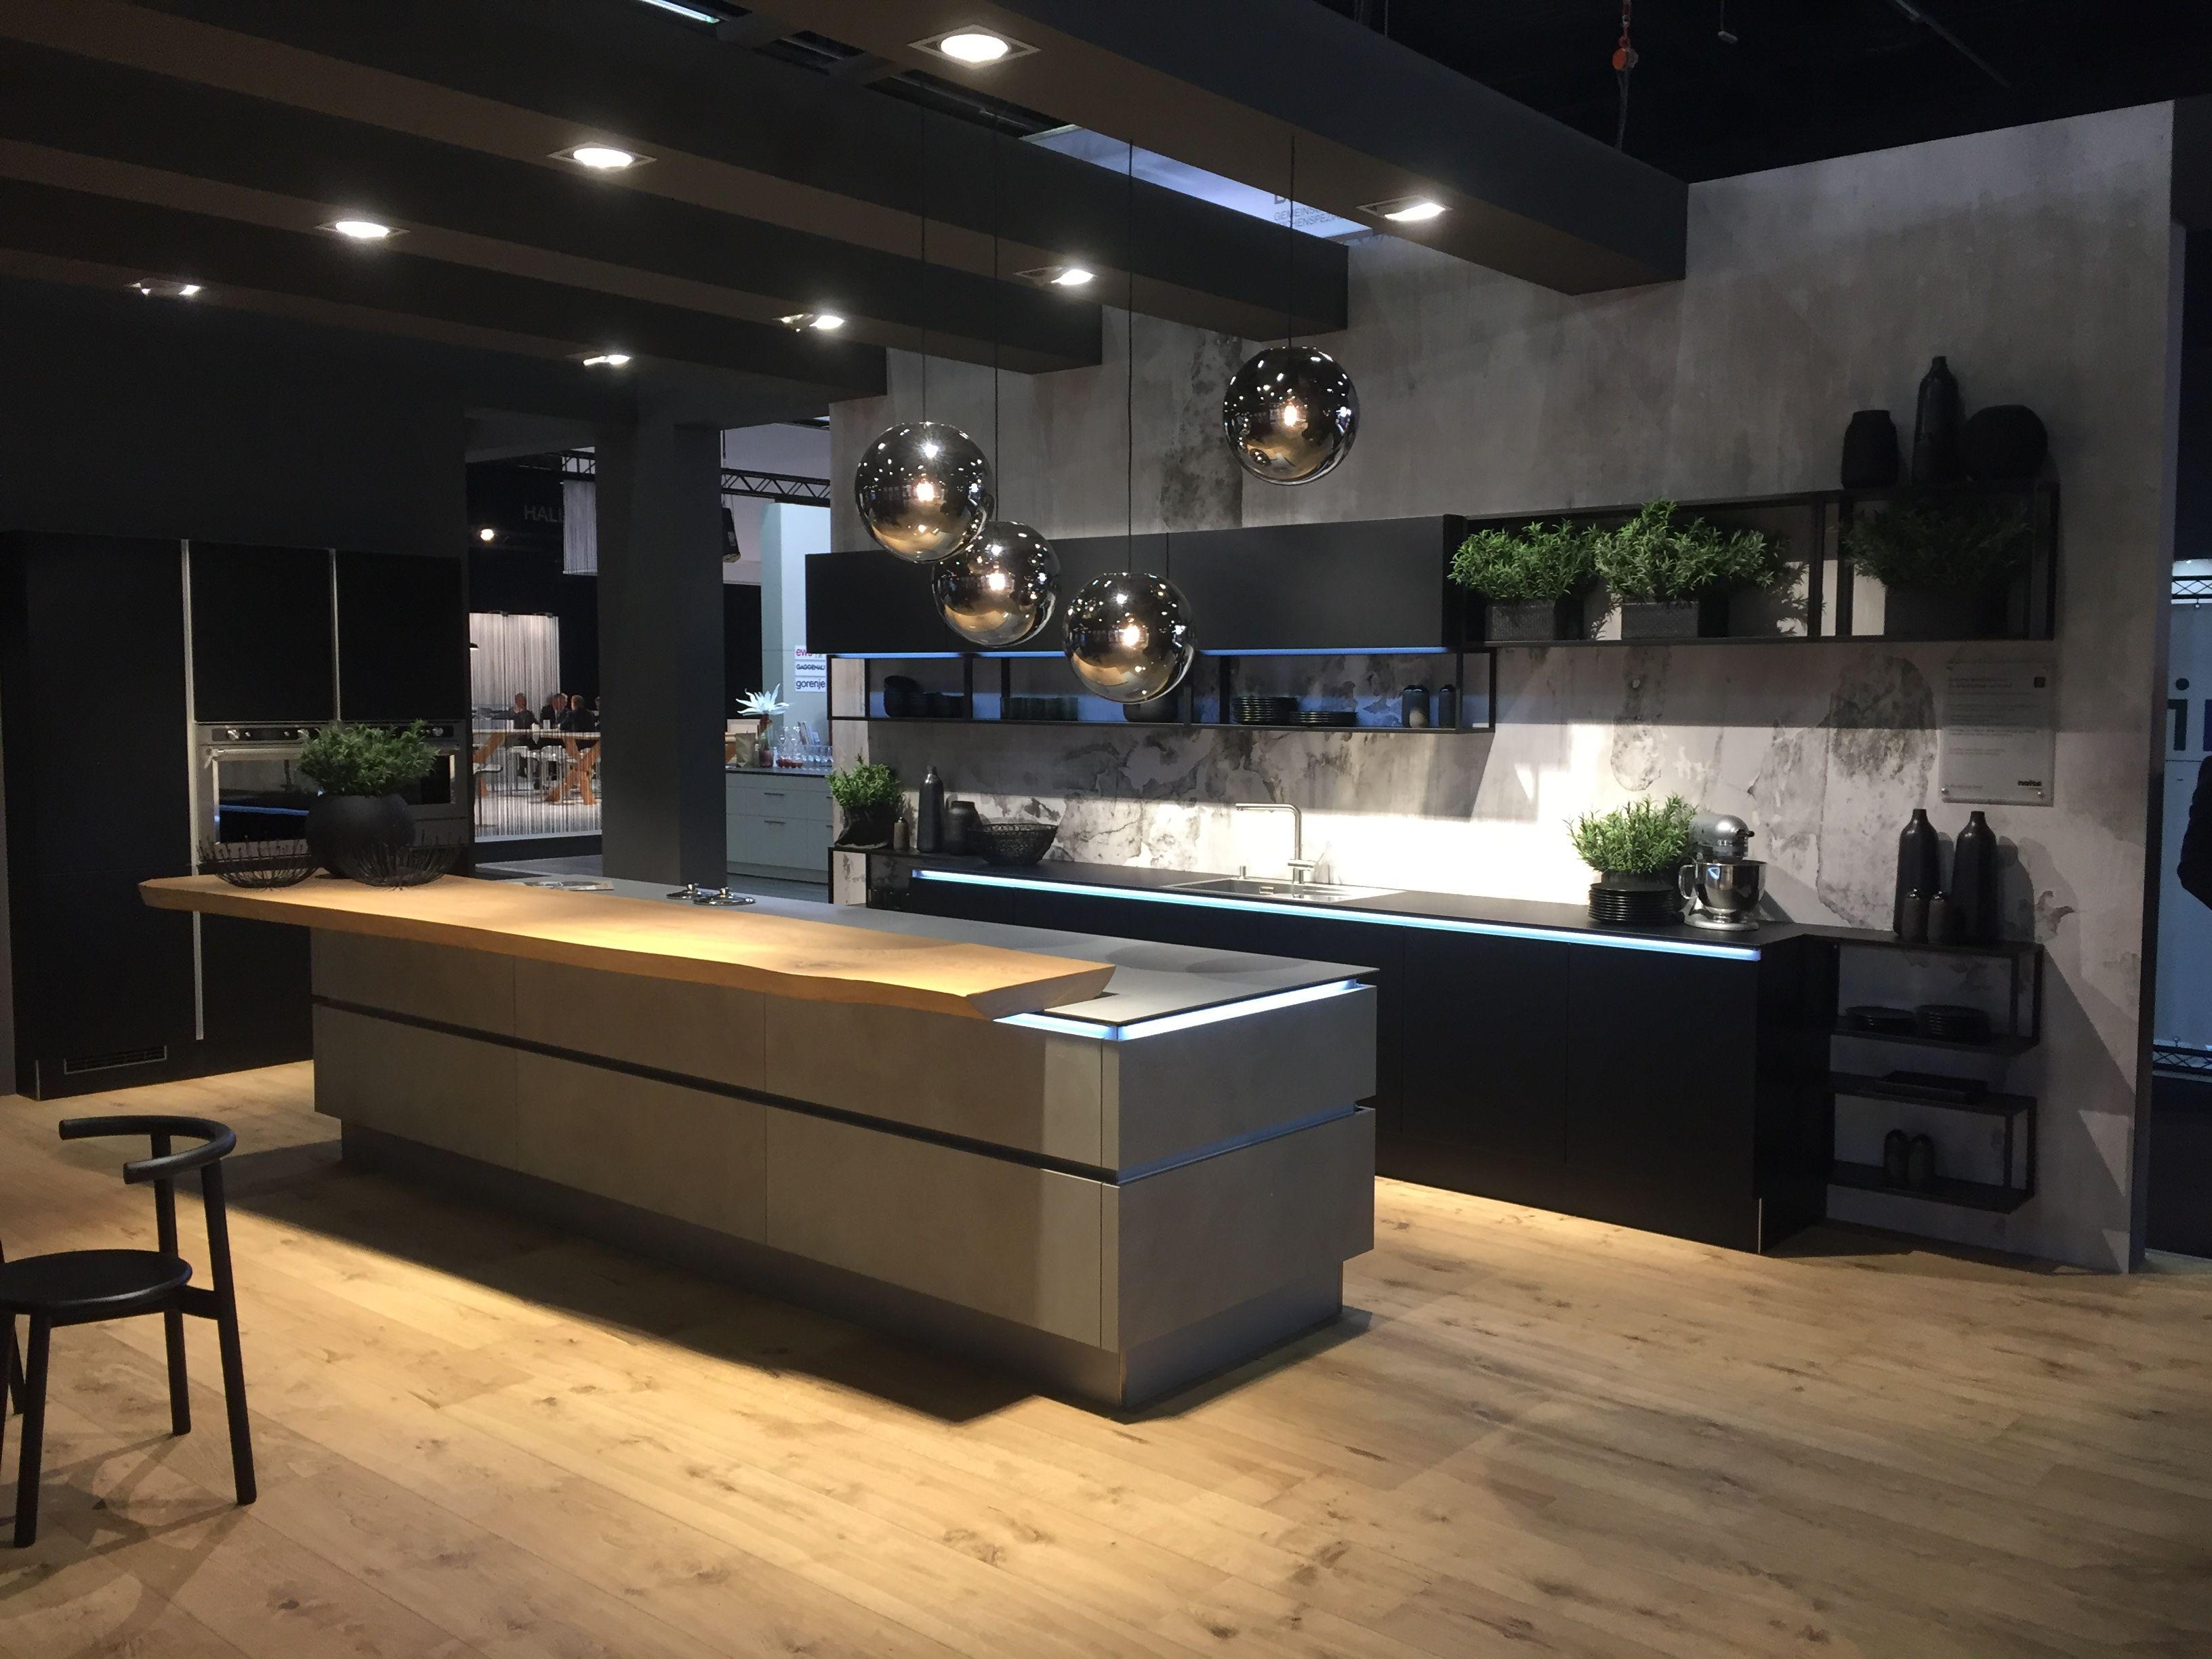 Nolte Kuchen Kitchen Home Kitchens Cocinas Cocinas Modernas